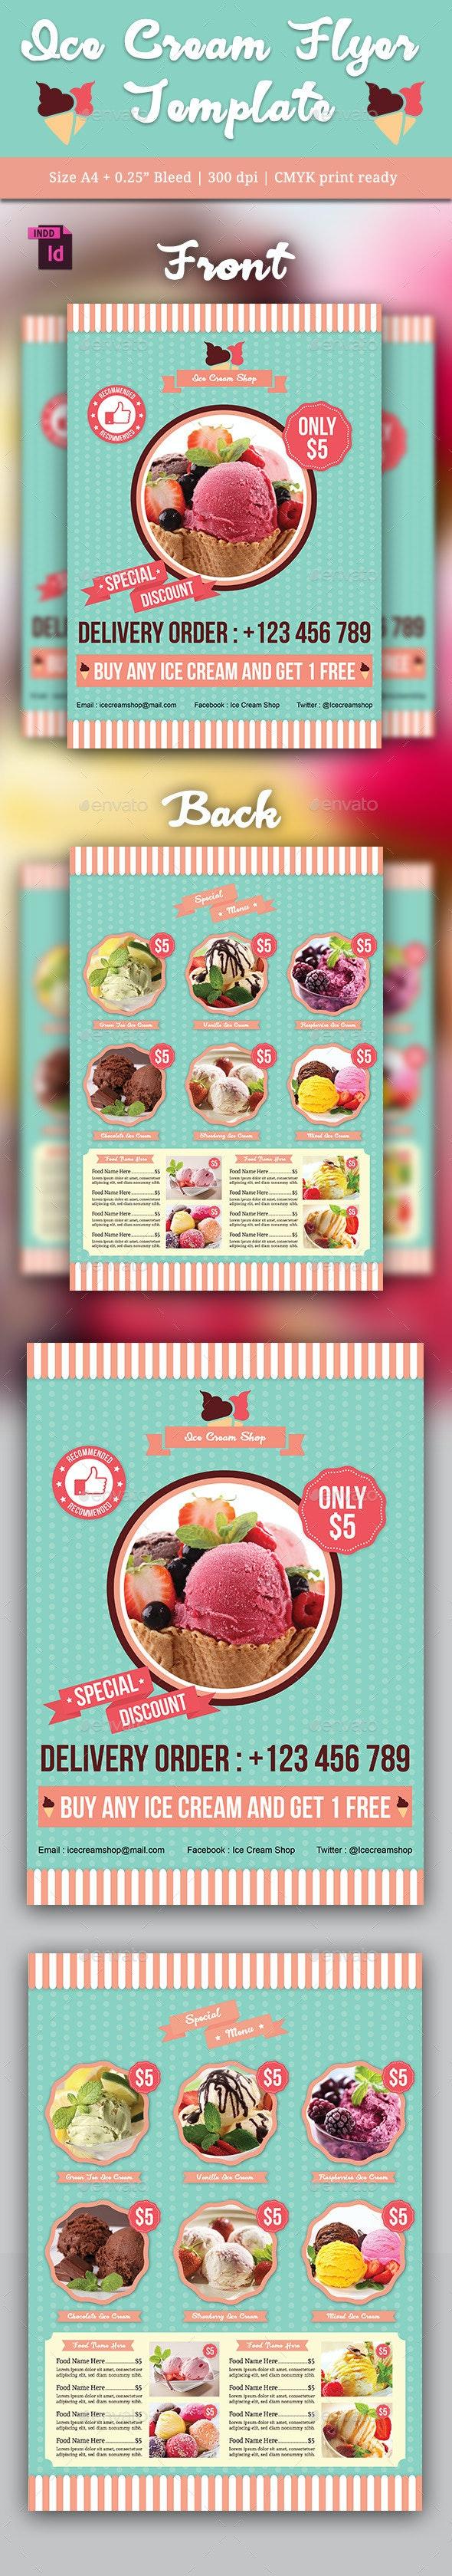 Ice Cream Flyer Template - Restaurant Flyers